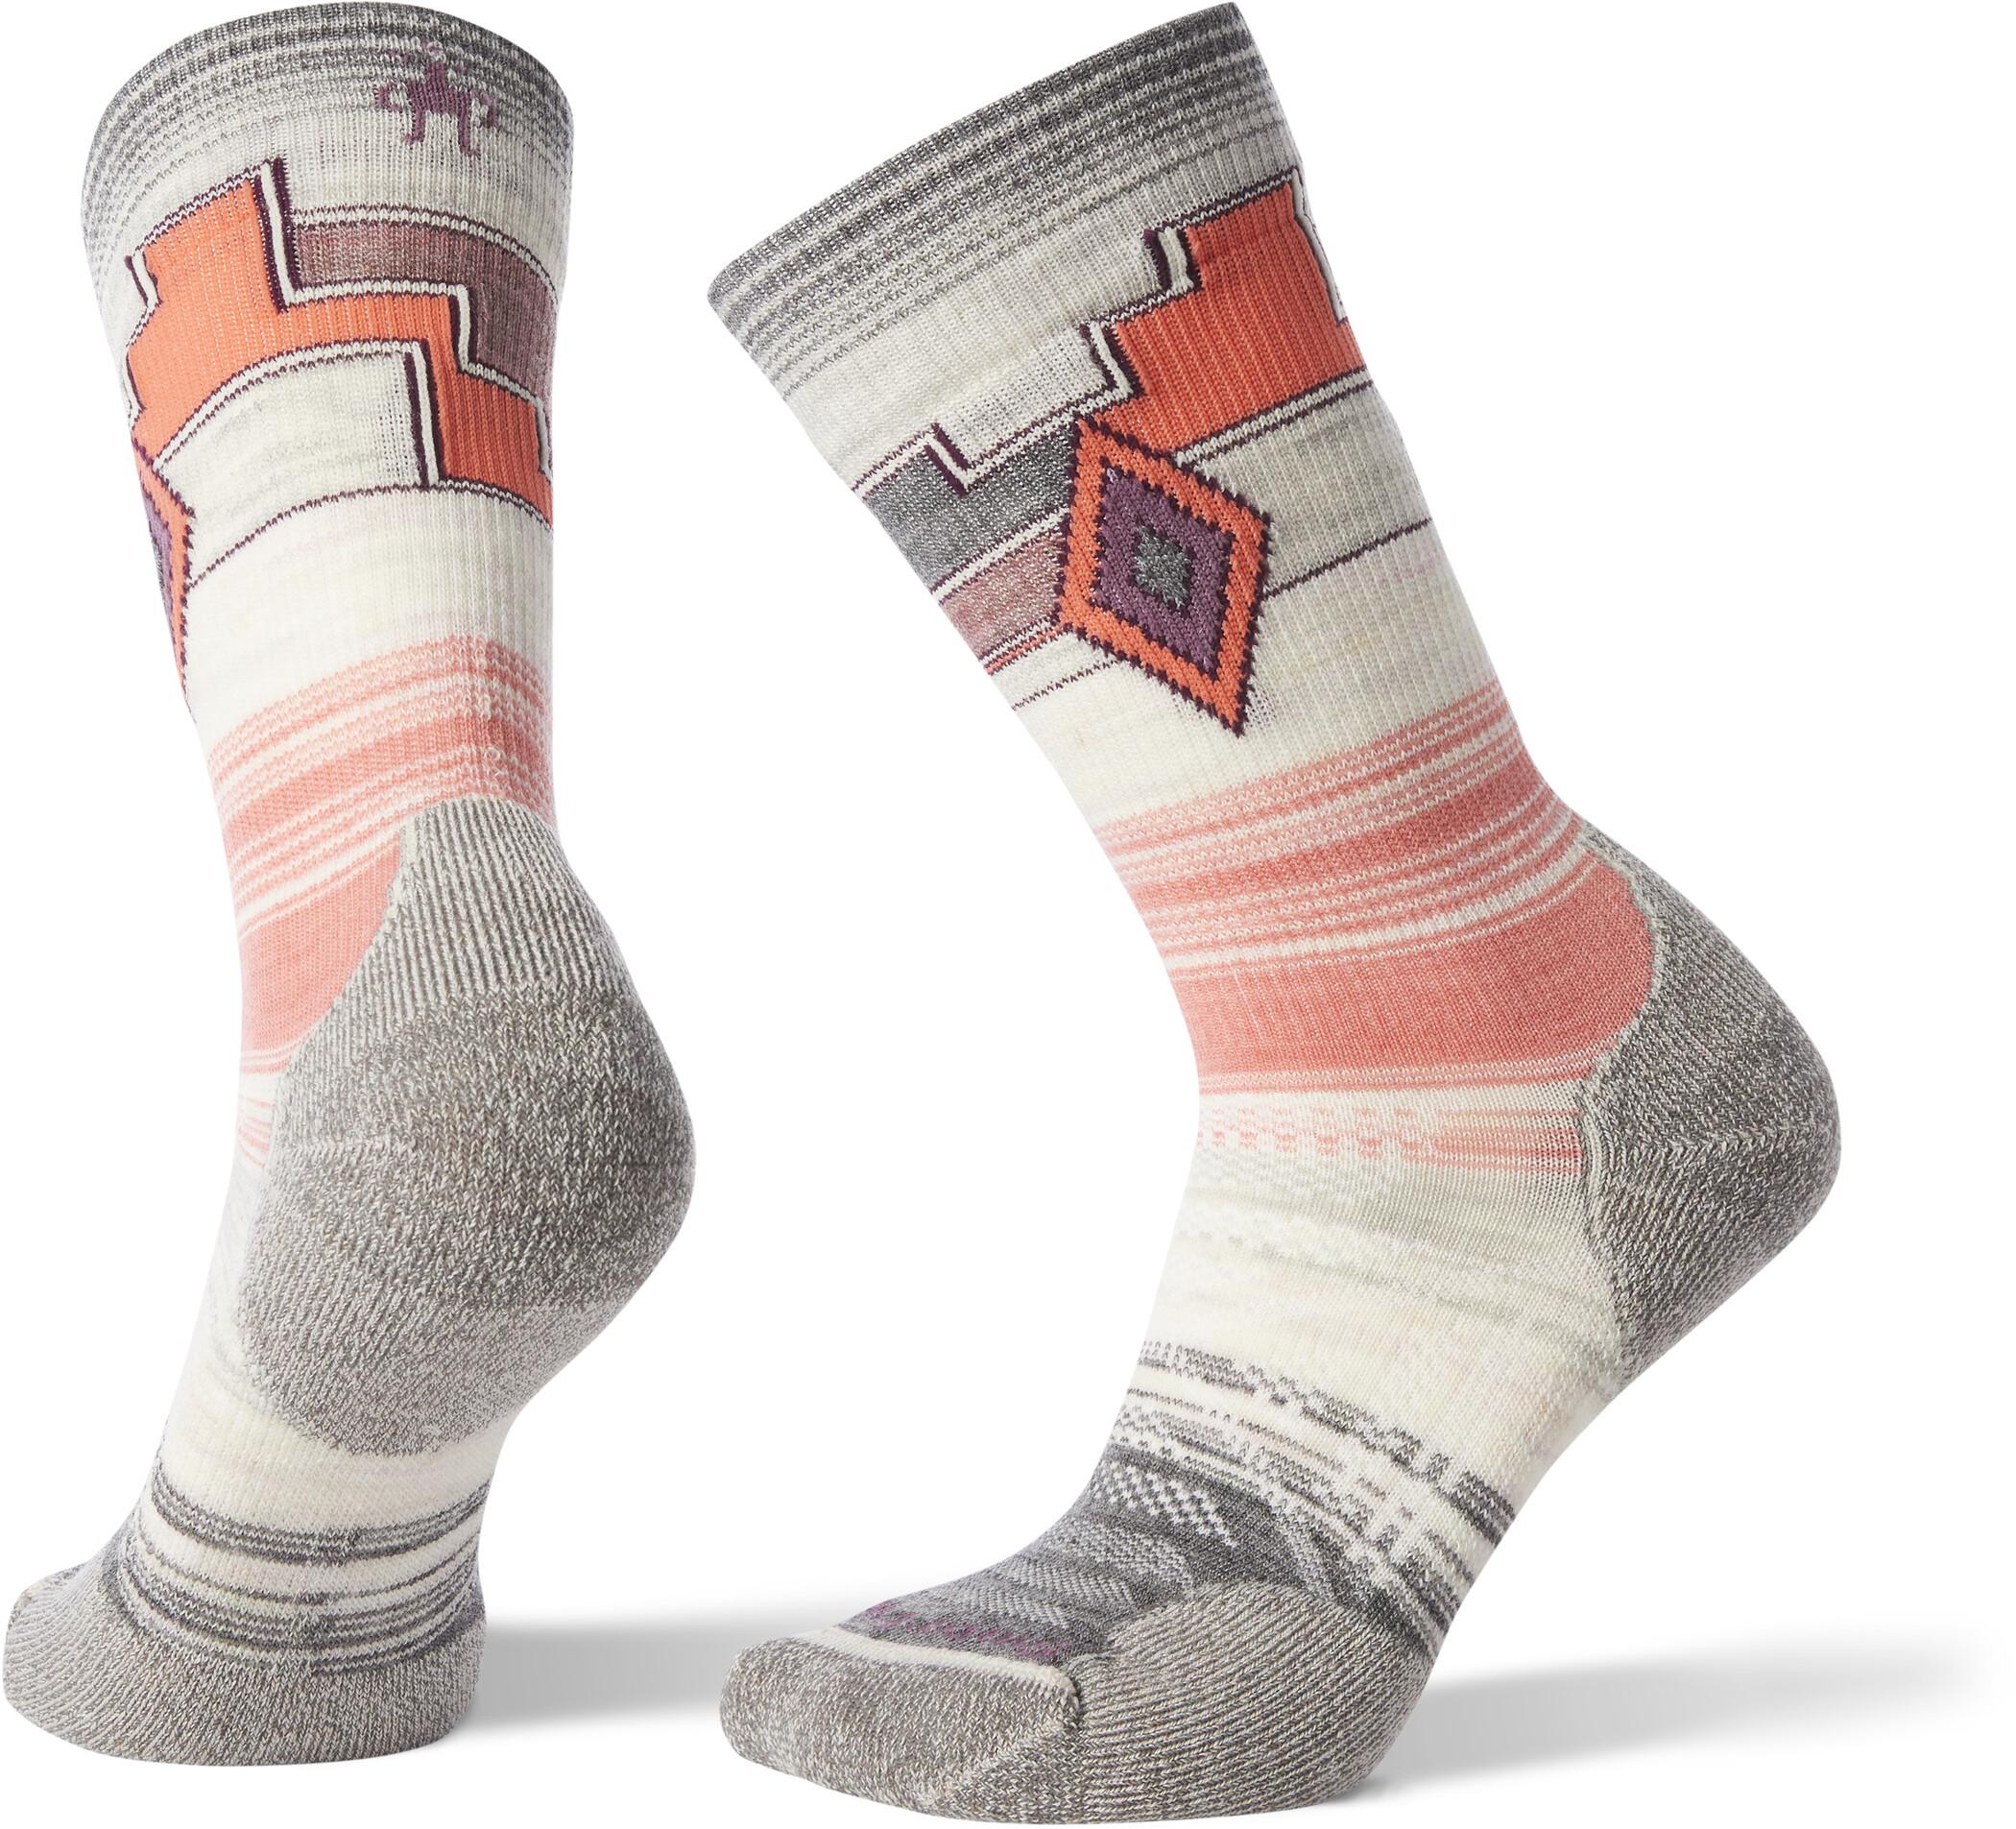 Merino Wool Performance Socks Smartwool Women/'s Margarita Crew Socks